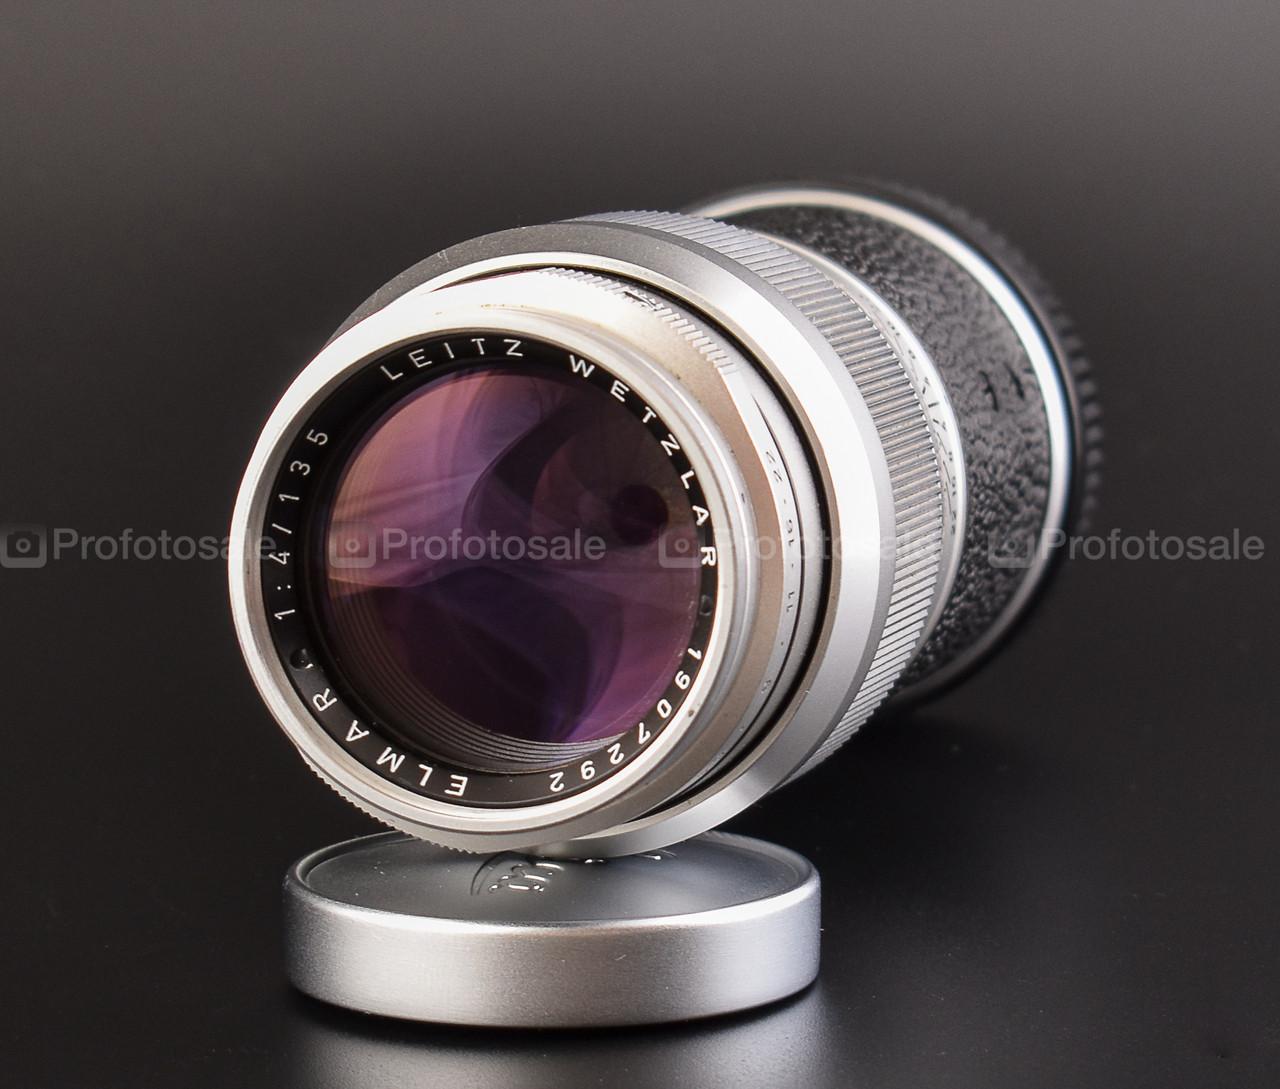 Фотообъектив Leica M Leitz Elmar 4/135mm